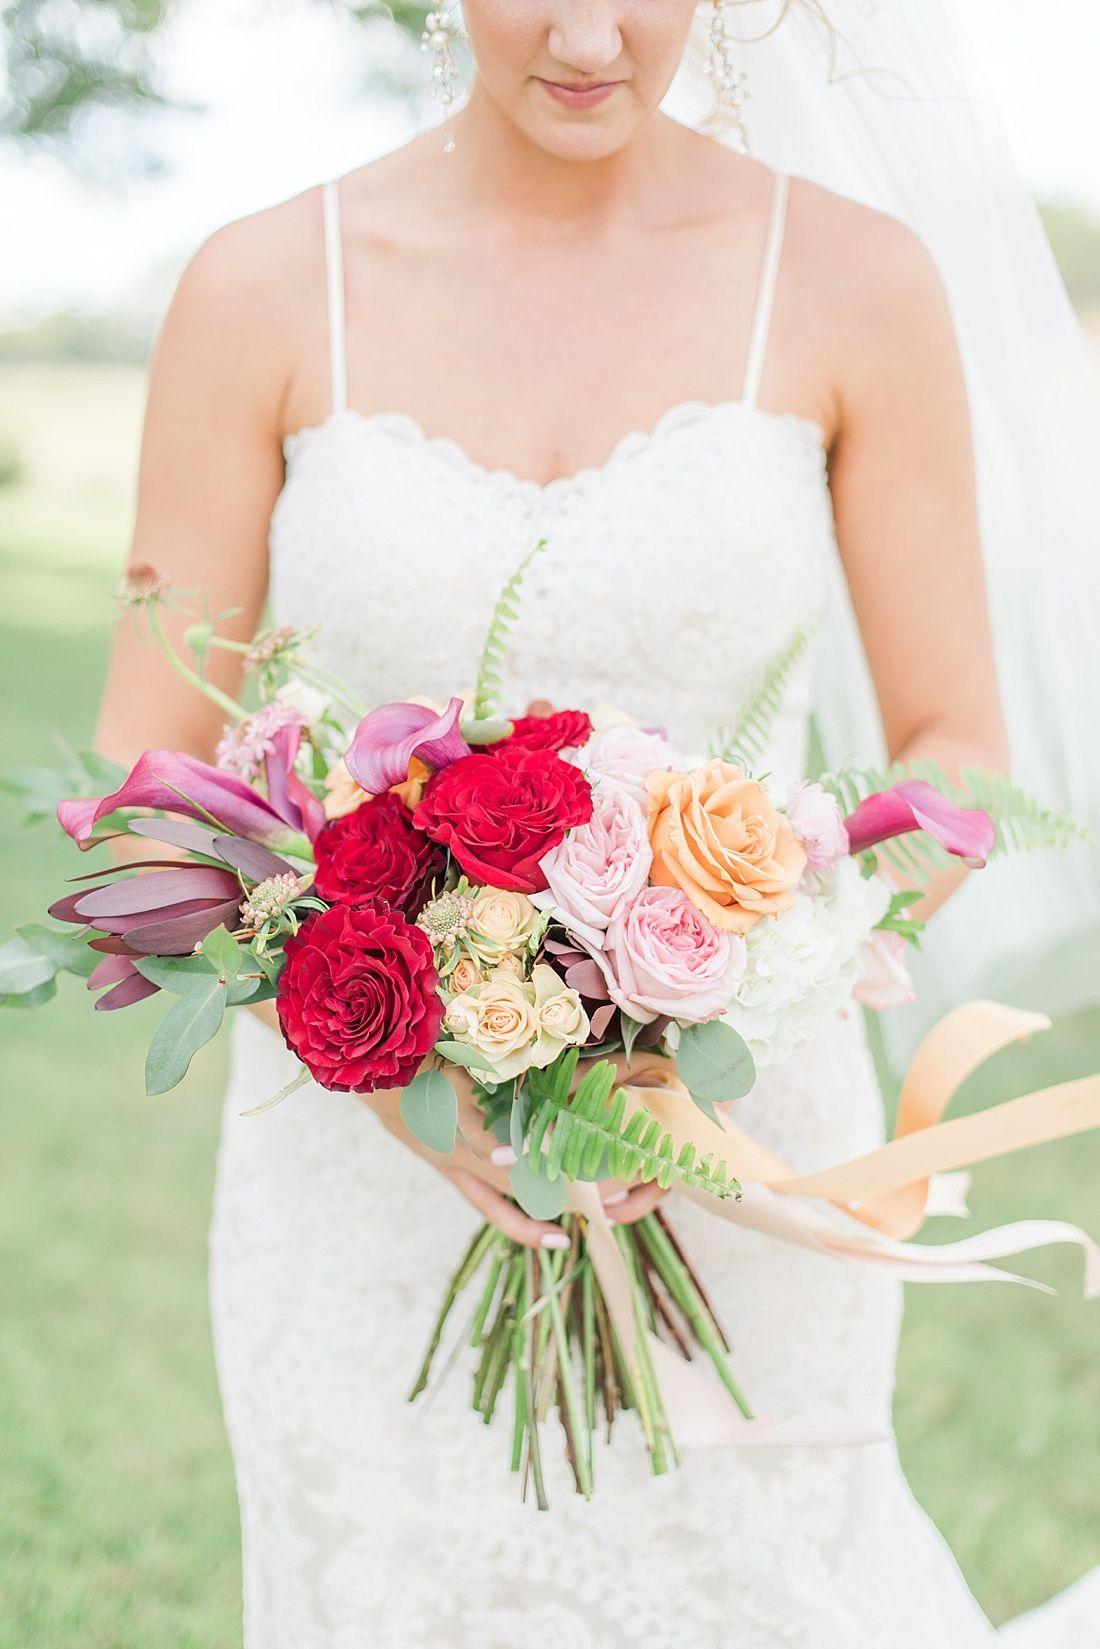 Grace + Anthony Cottage wedding, Bridesmaid bouquet